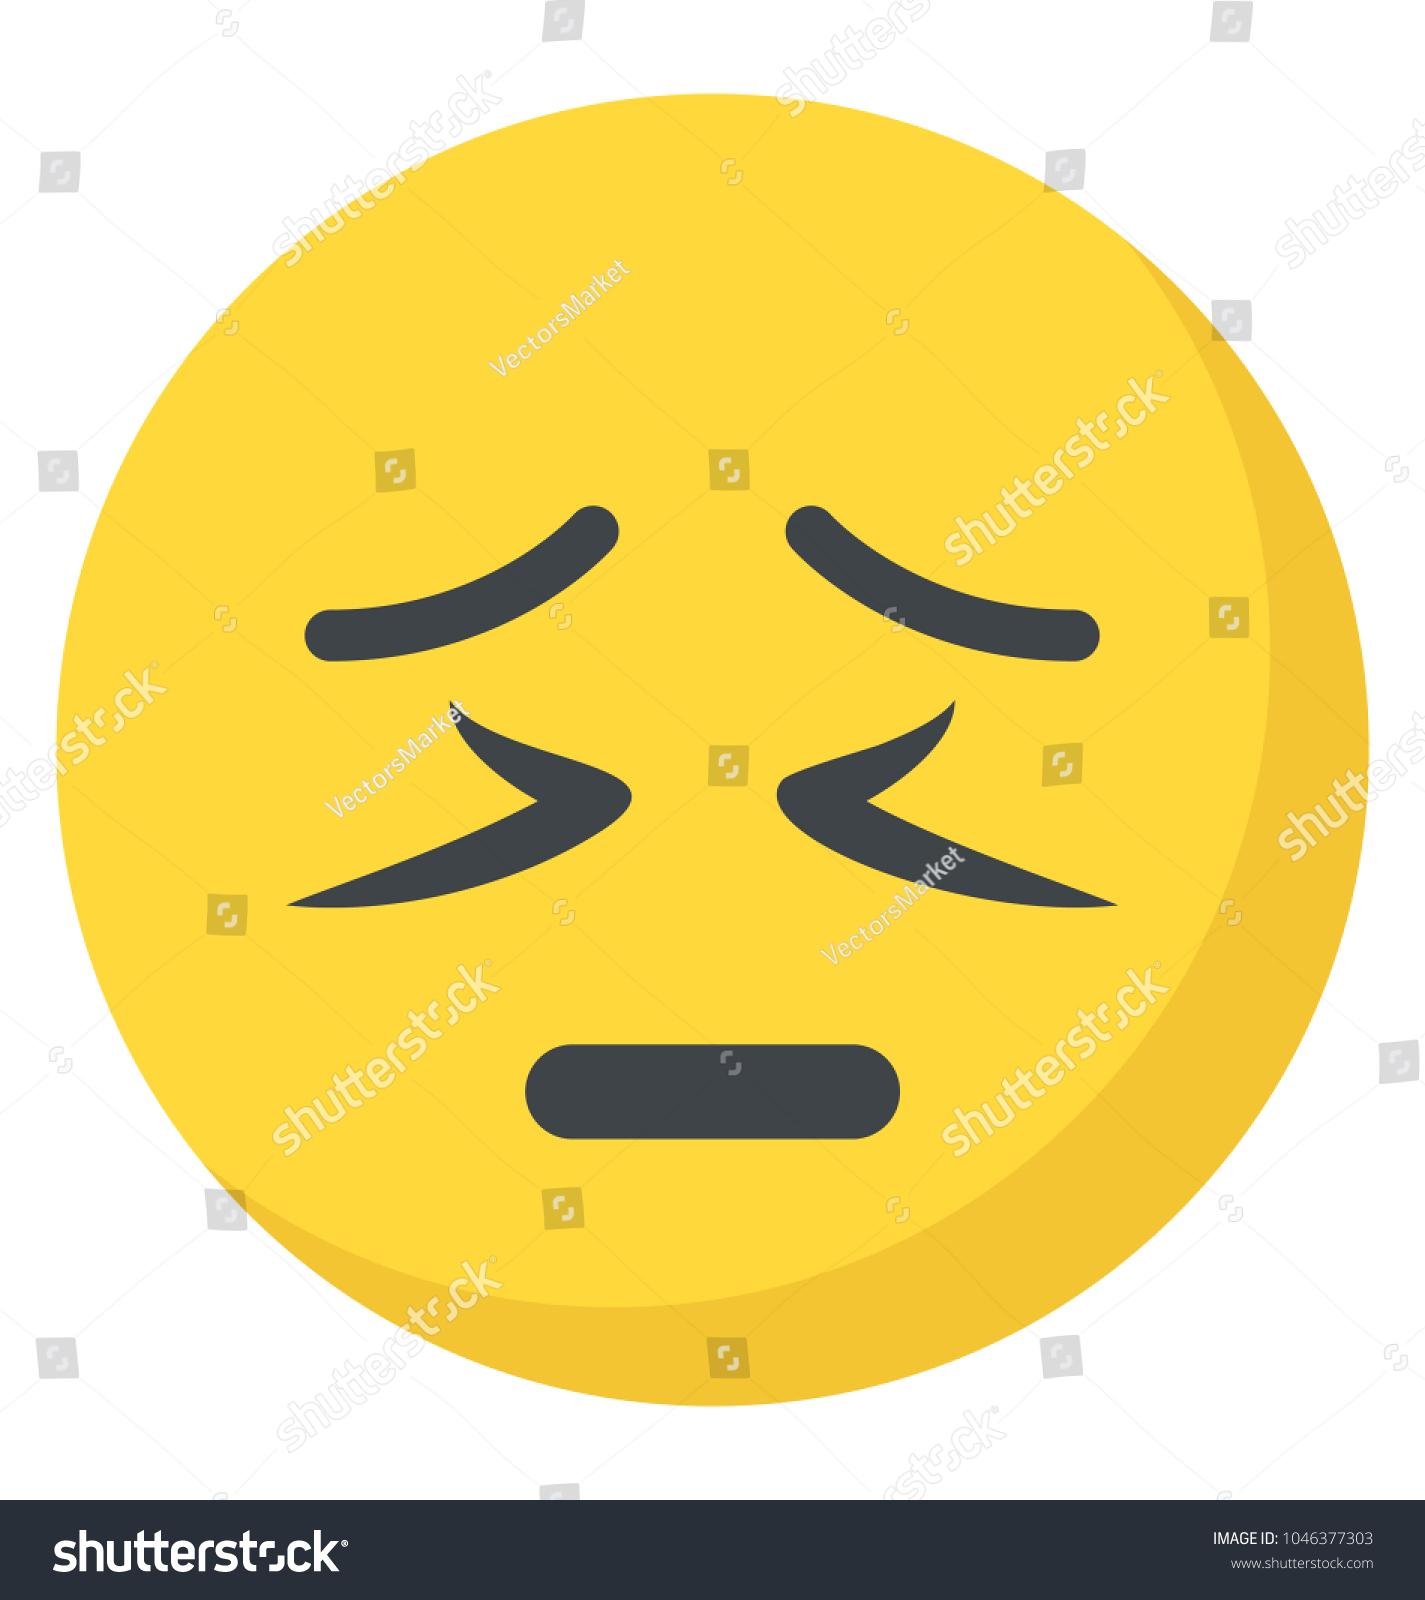 Images for sad smiley faces impremedia sad smiley face depressed concept stock vector 1046377303 sad smiley face depressed concept buycottarizona choice image buycottarizona Gallery